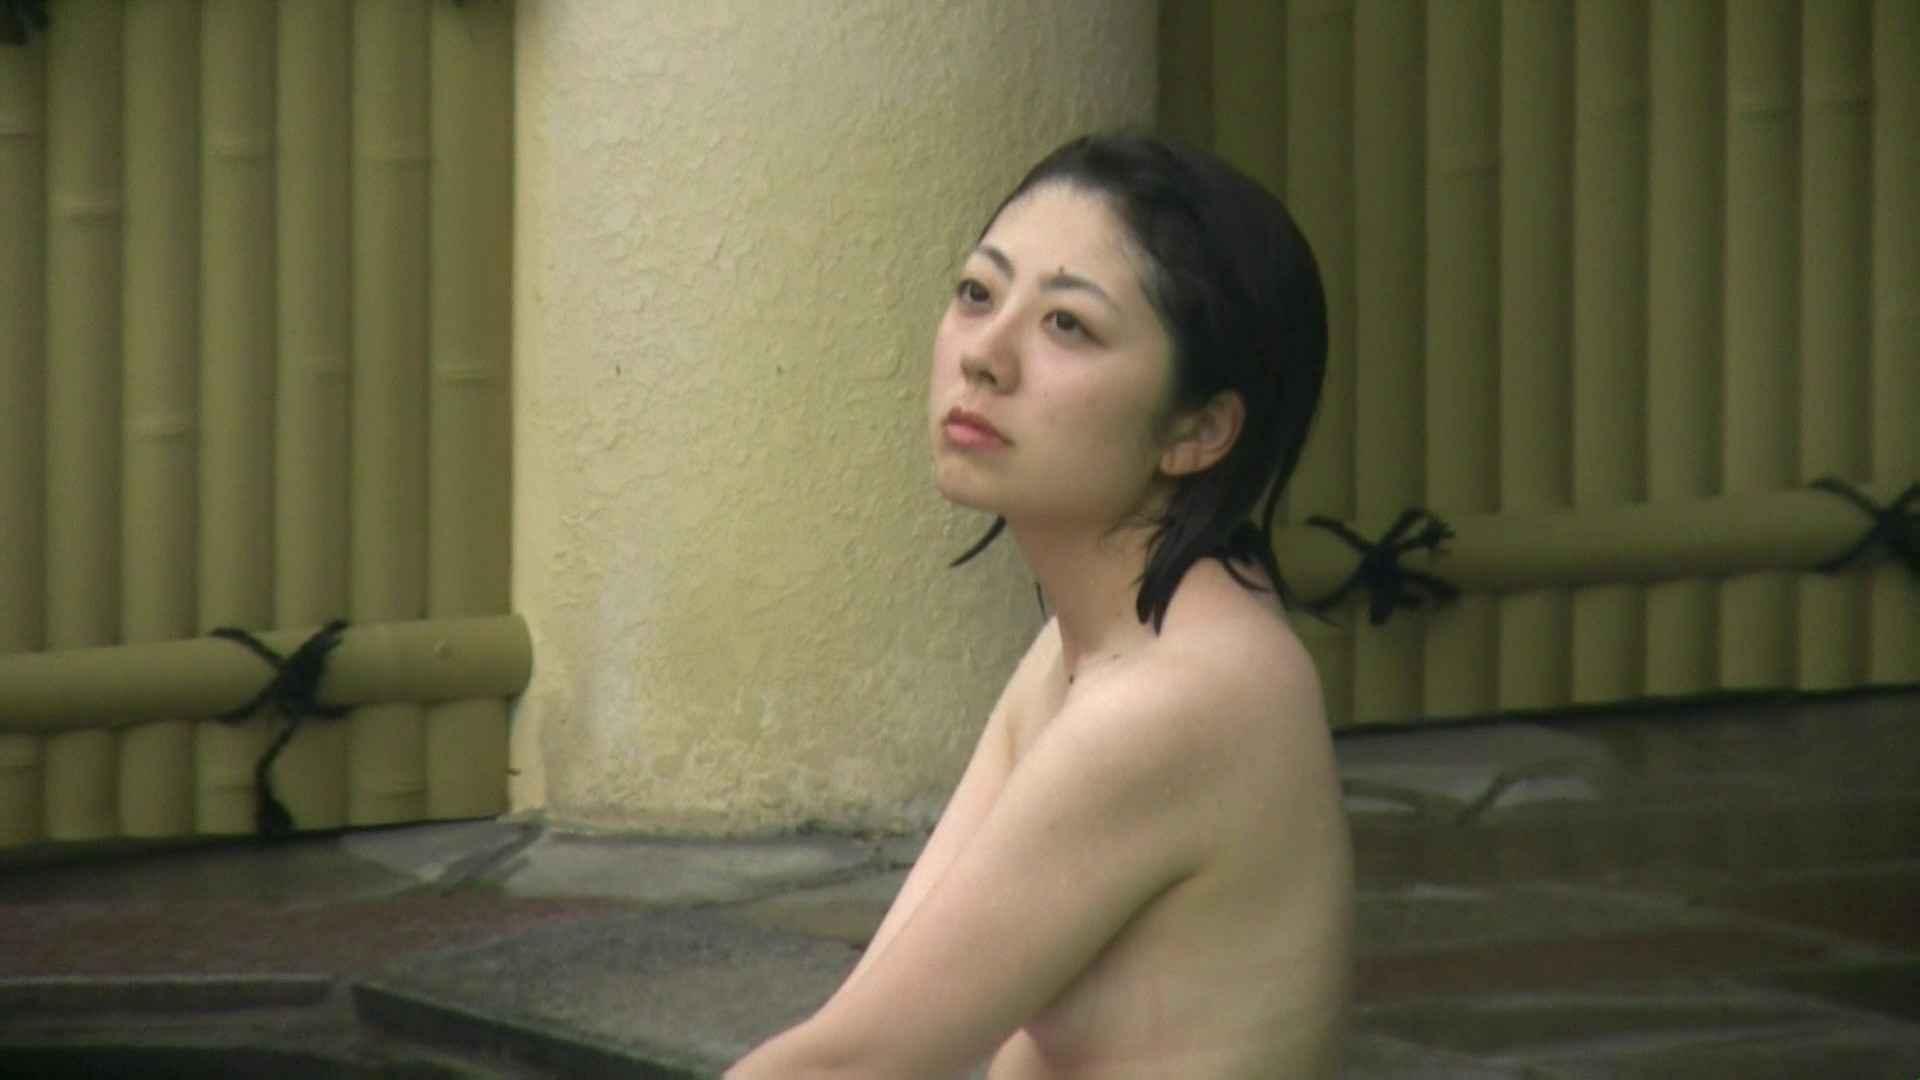 Aquaな露天風呂Vol.04 露天 オメコ無修正動画無料 84pic 4